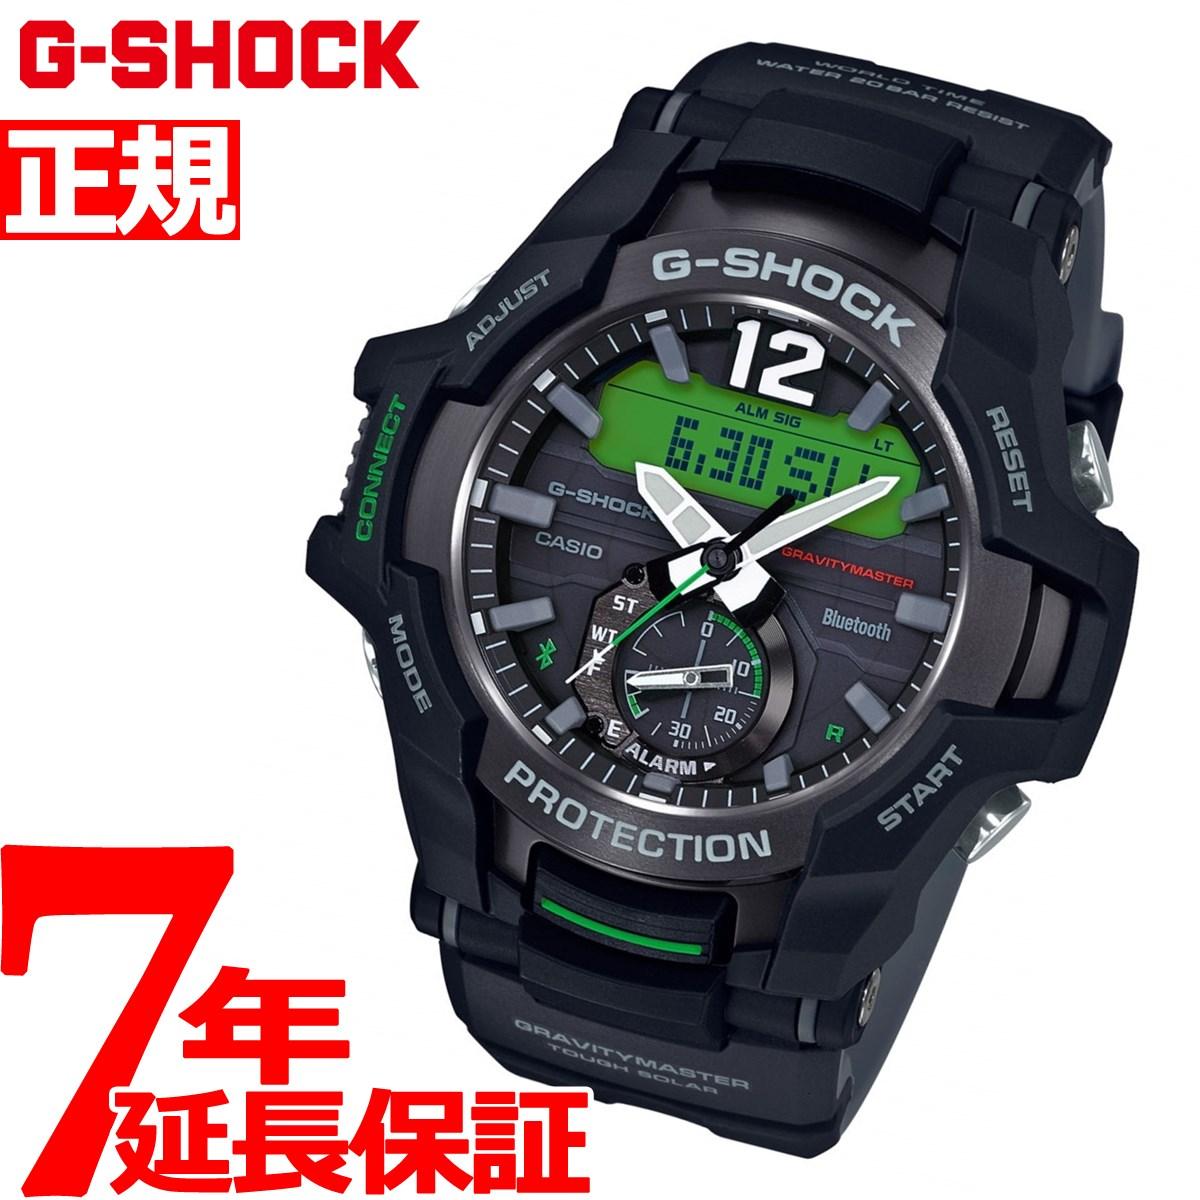 G-SHOCK カシオ Gショック グラビティマスター CASIO 腕時計 メンズ MASTER OF G GR-B100-1A3JF【2018 新作】